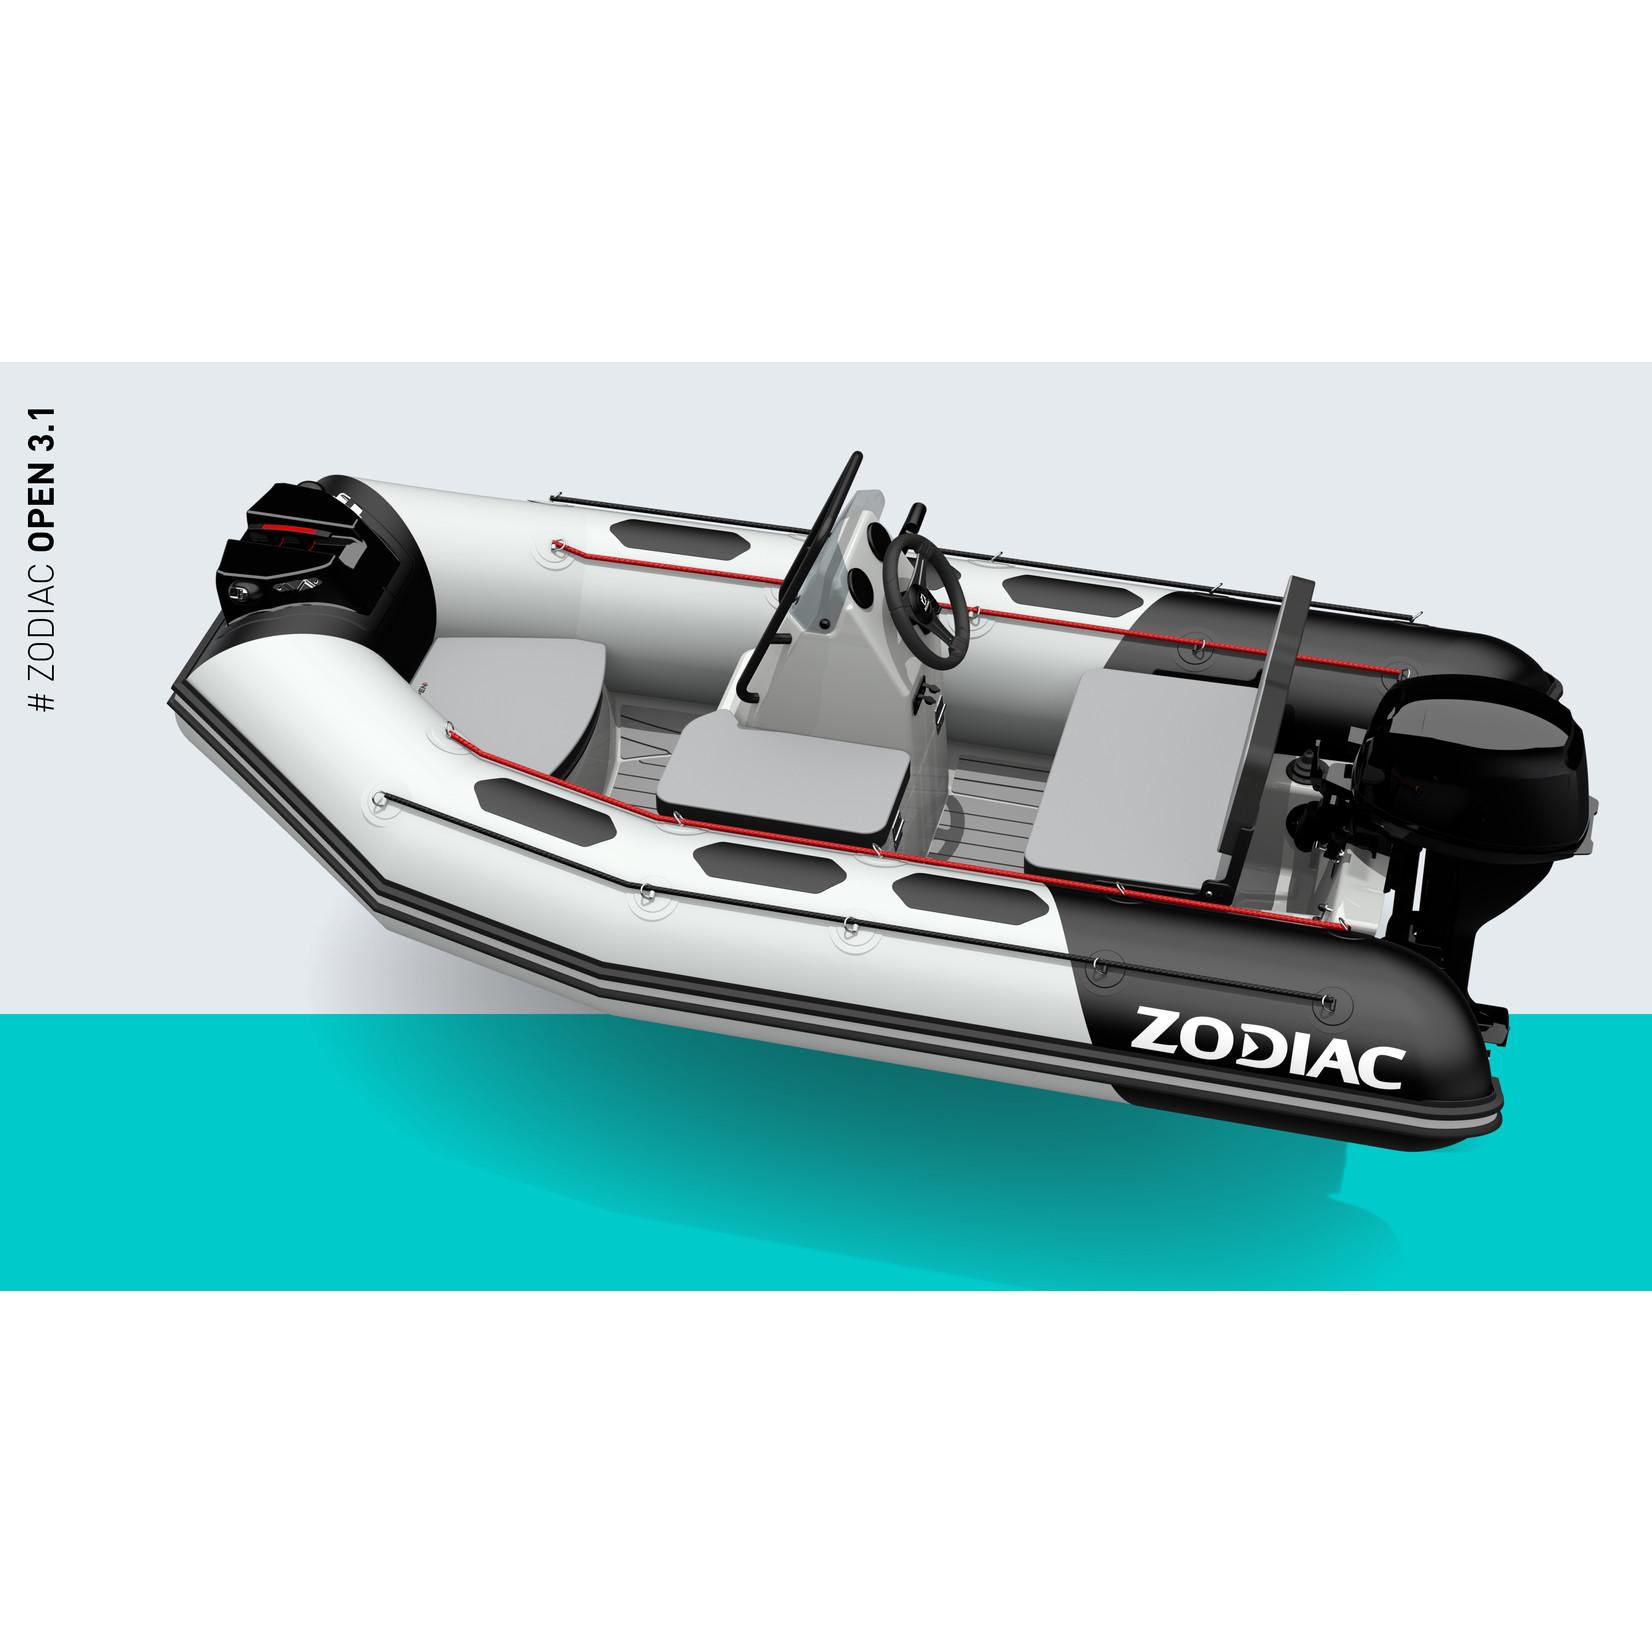 Zodiac OPEN 3.1 - PVC/Strongan tube - hull in light or dark grey (3.10 m)